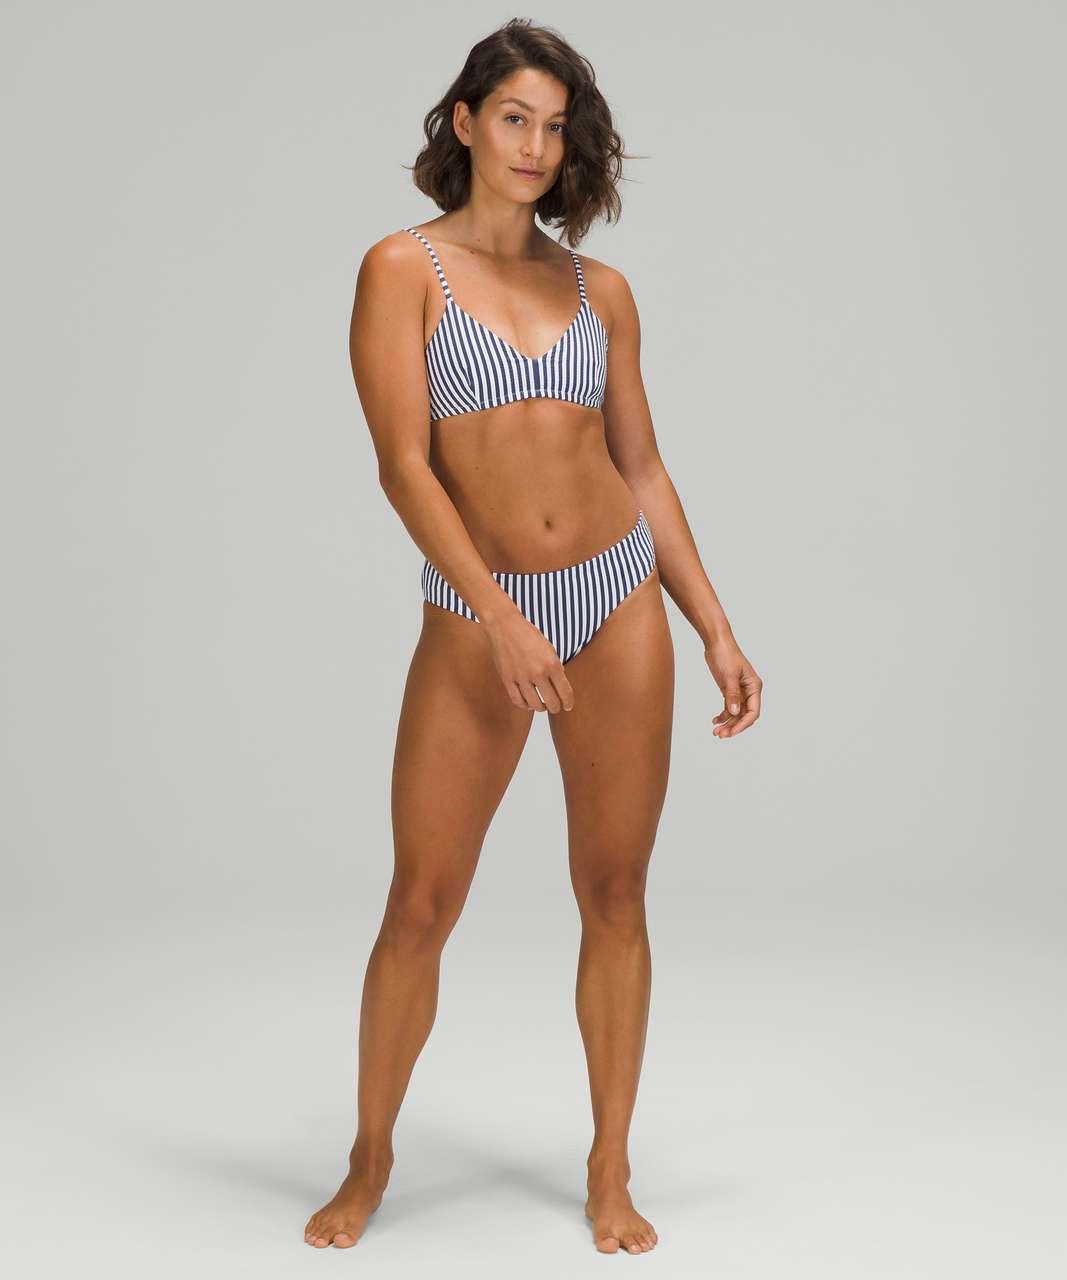 Lululemon Seersucker Triangle Swim Top *A/B Cups - Energize Stripe White Blue Hail